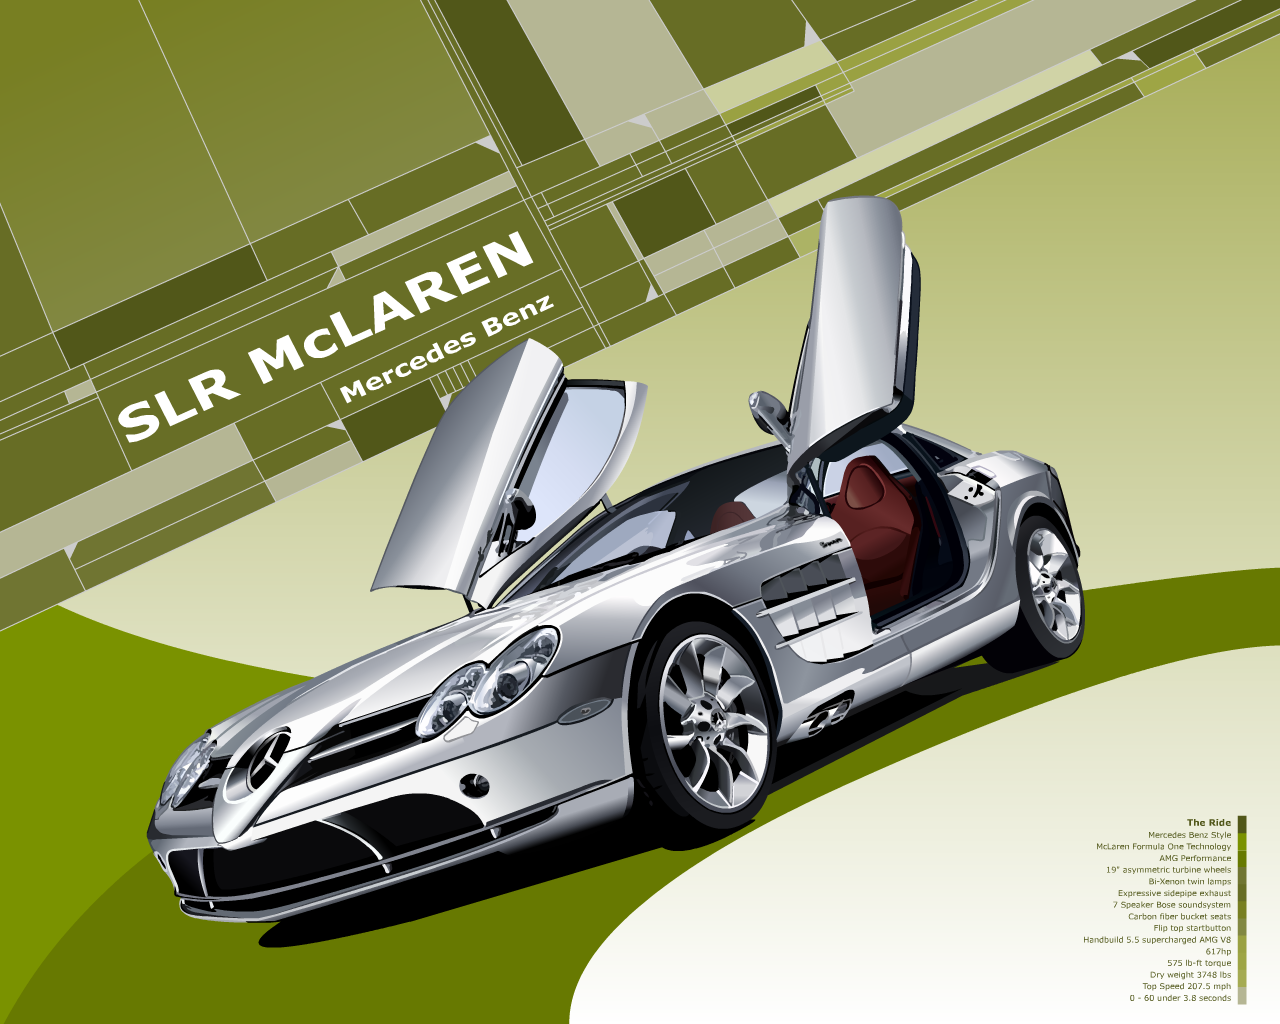 SLR McLaren Wallpaper by taw